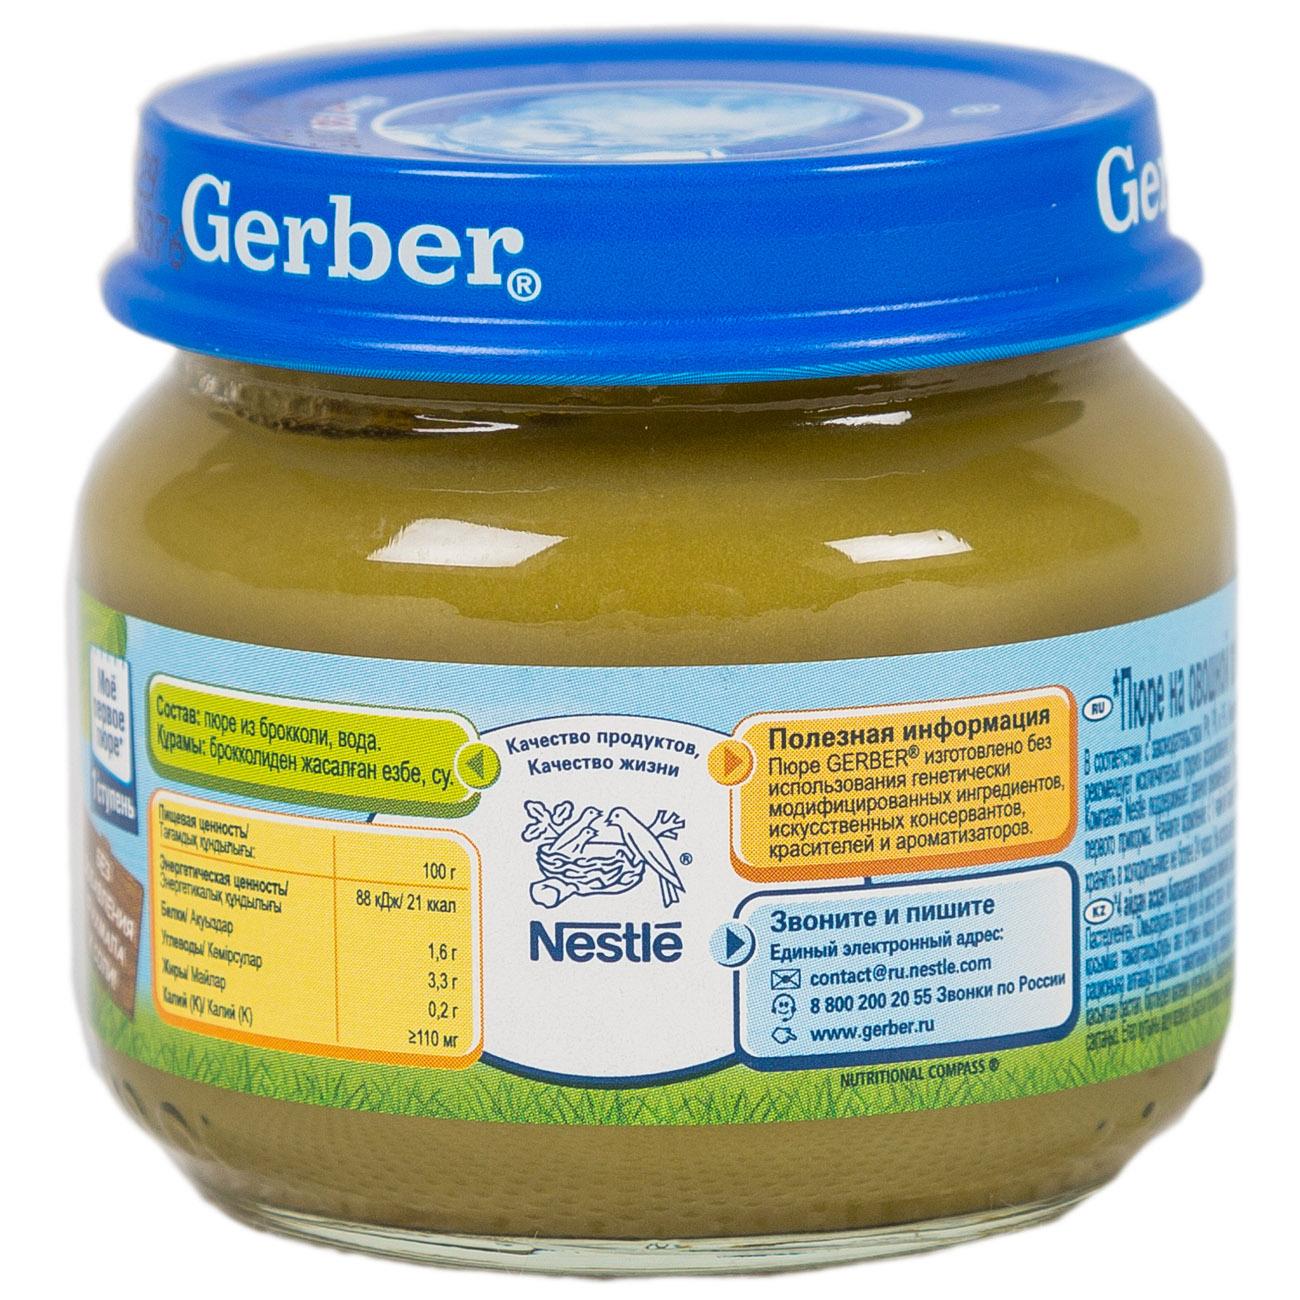 ���� Gerber ������� 80 �� ��������  (1 �������)